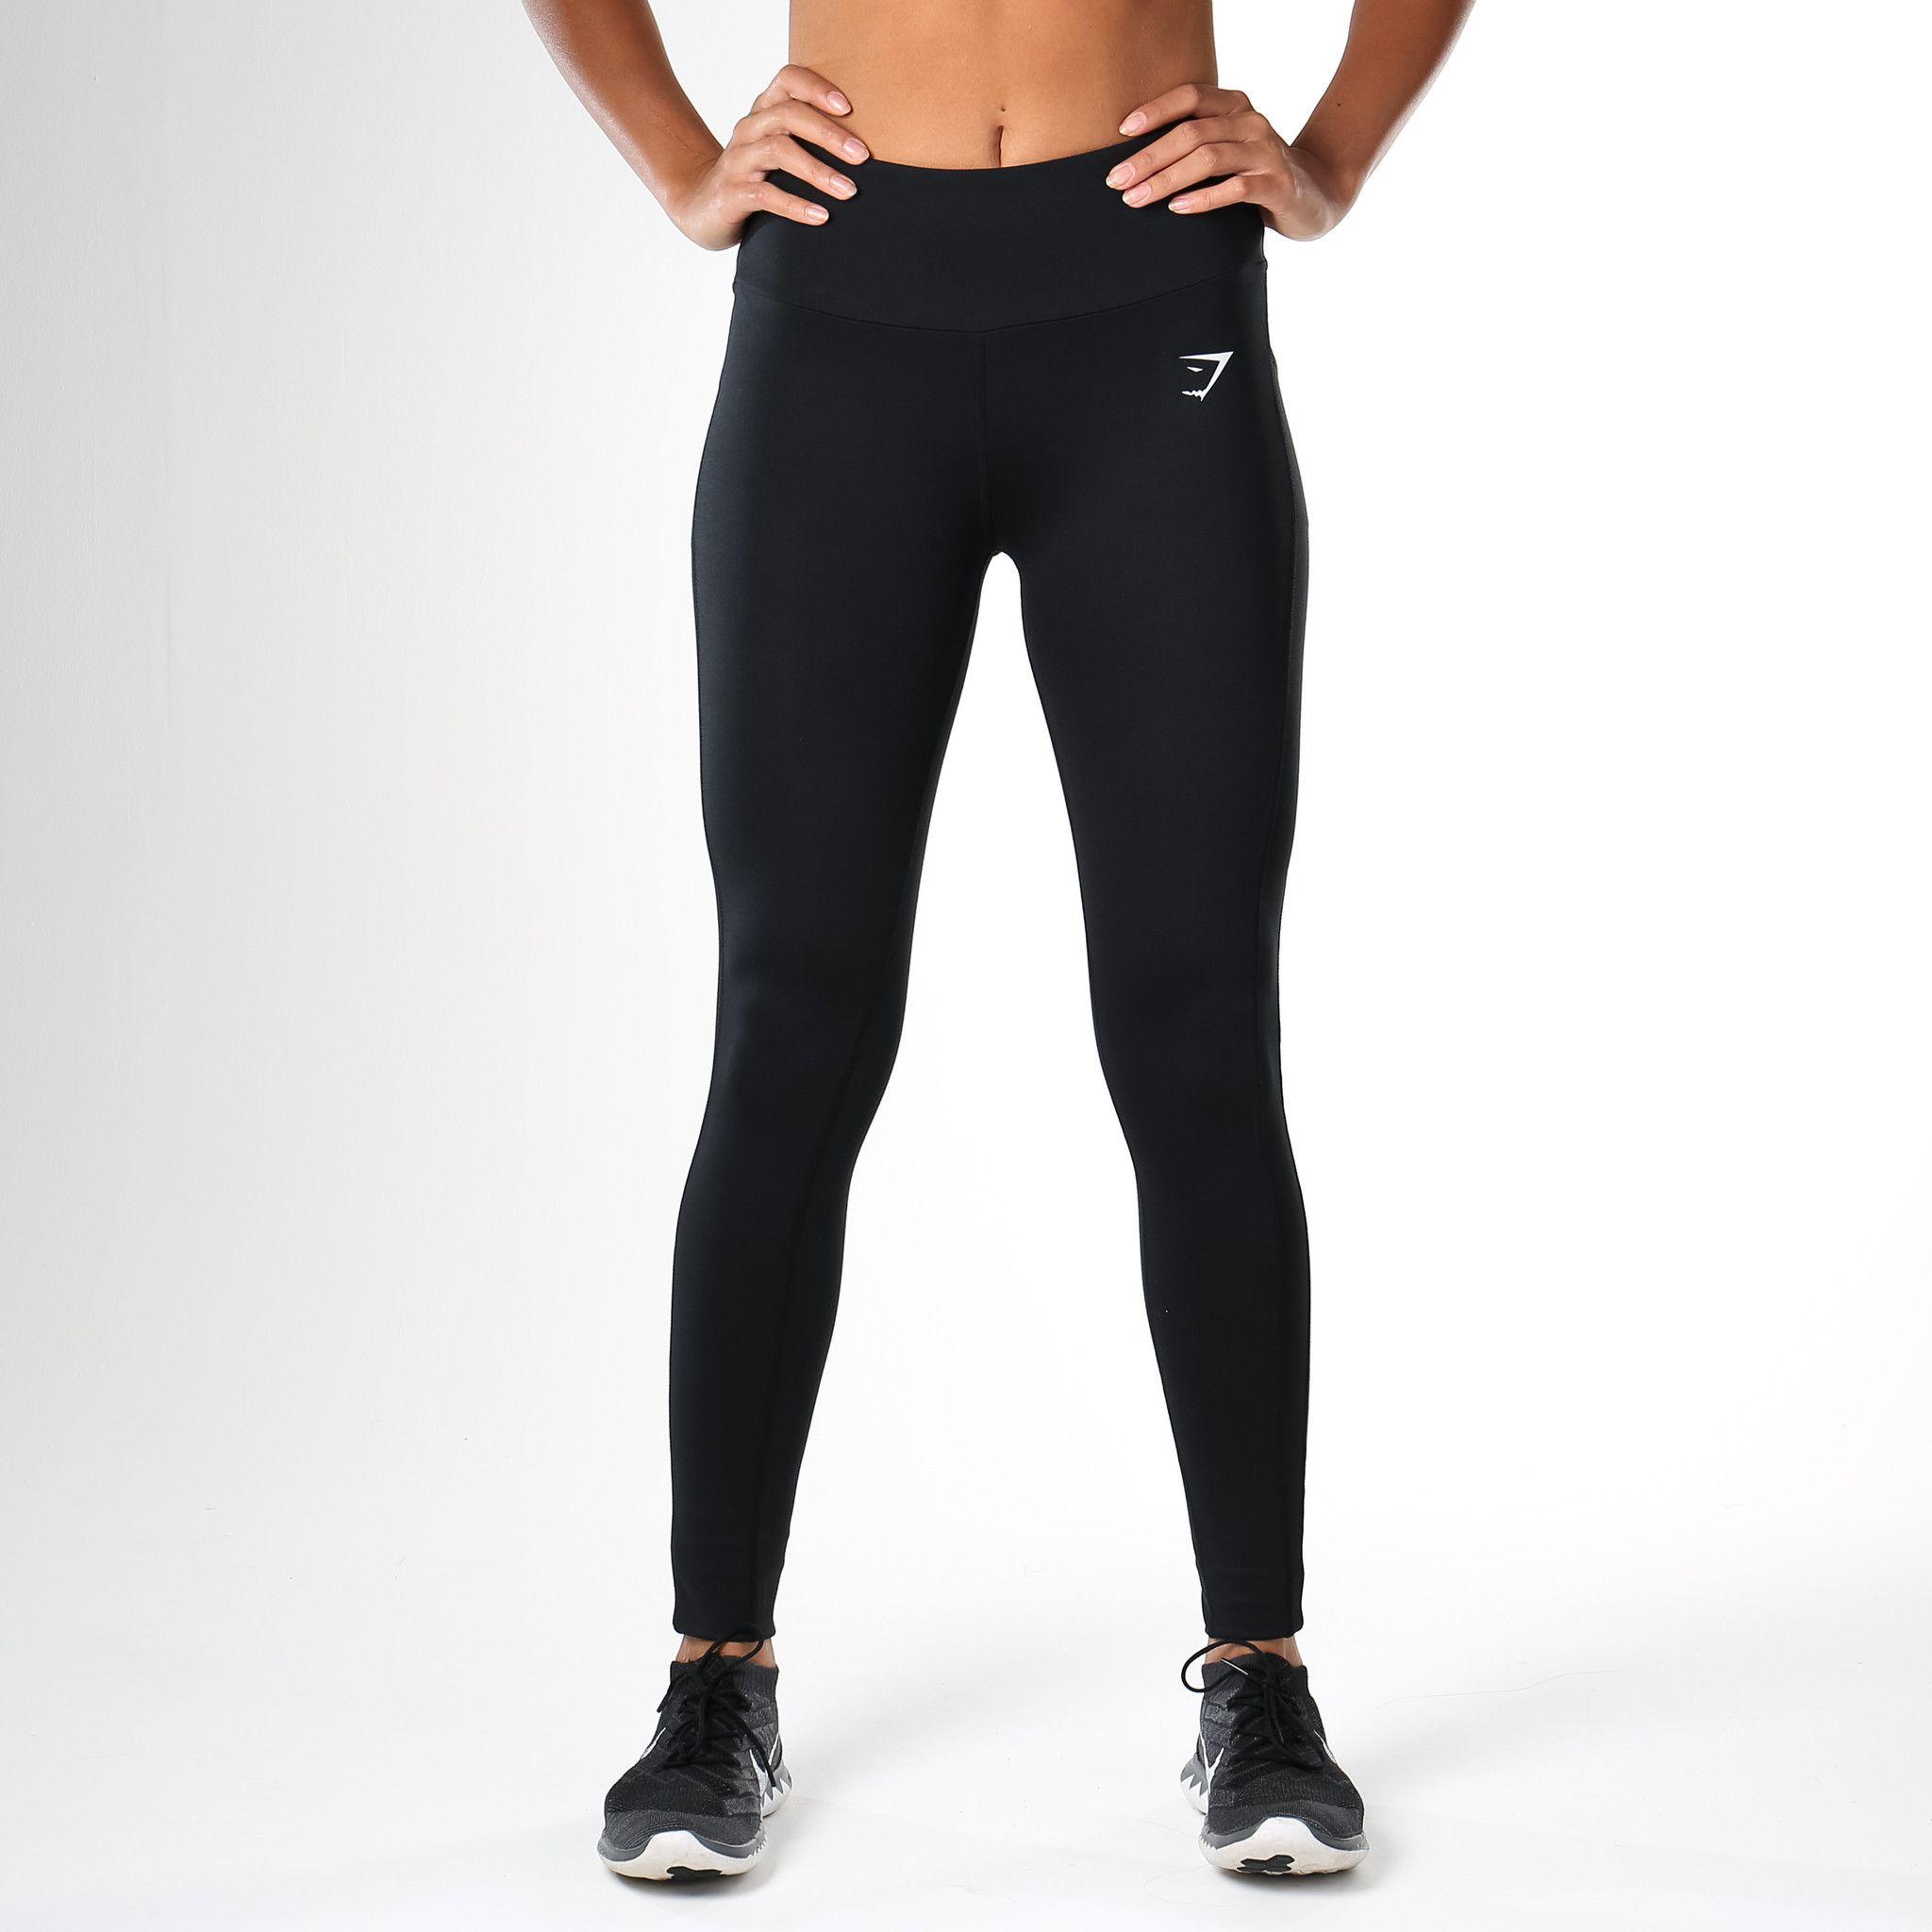 6f30b94208f74b Gymshark DRY Sculpture Leggings - Black Running Leggings, Gym Leggings,  Workout Leggings, Workout